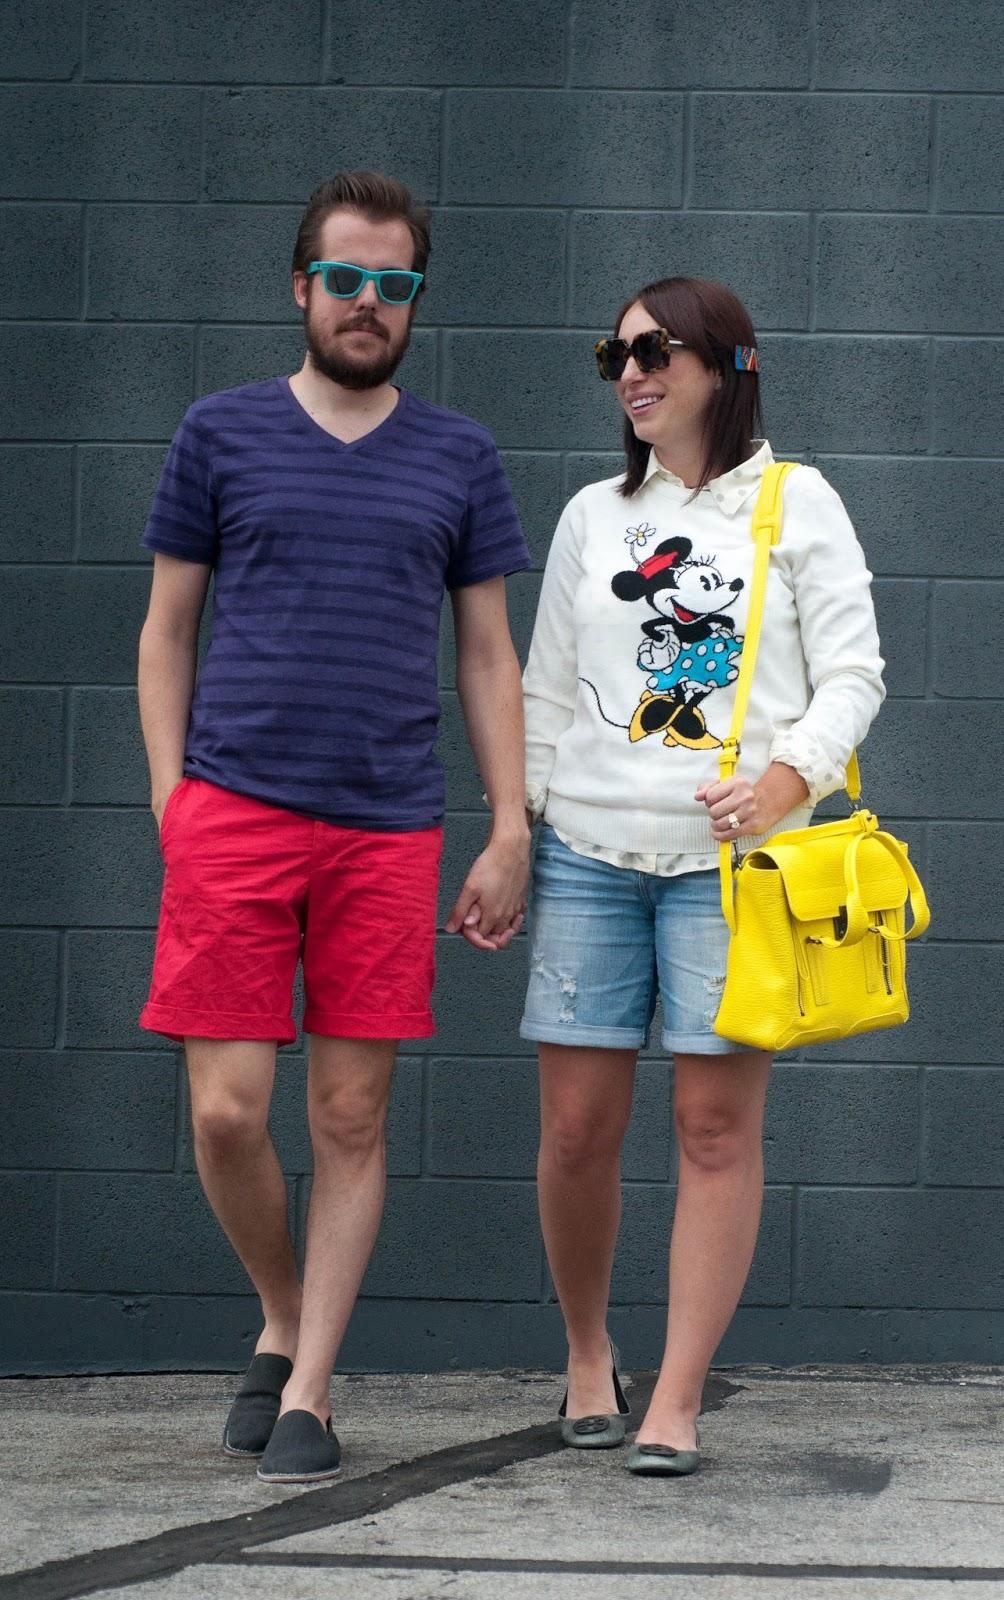 couple fashion, ootd, mens ootd, style blog, fashion blog, tory burch reva flats, wiw